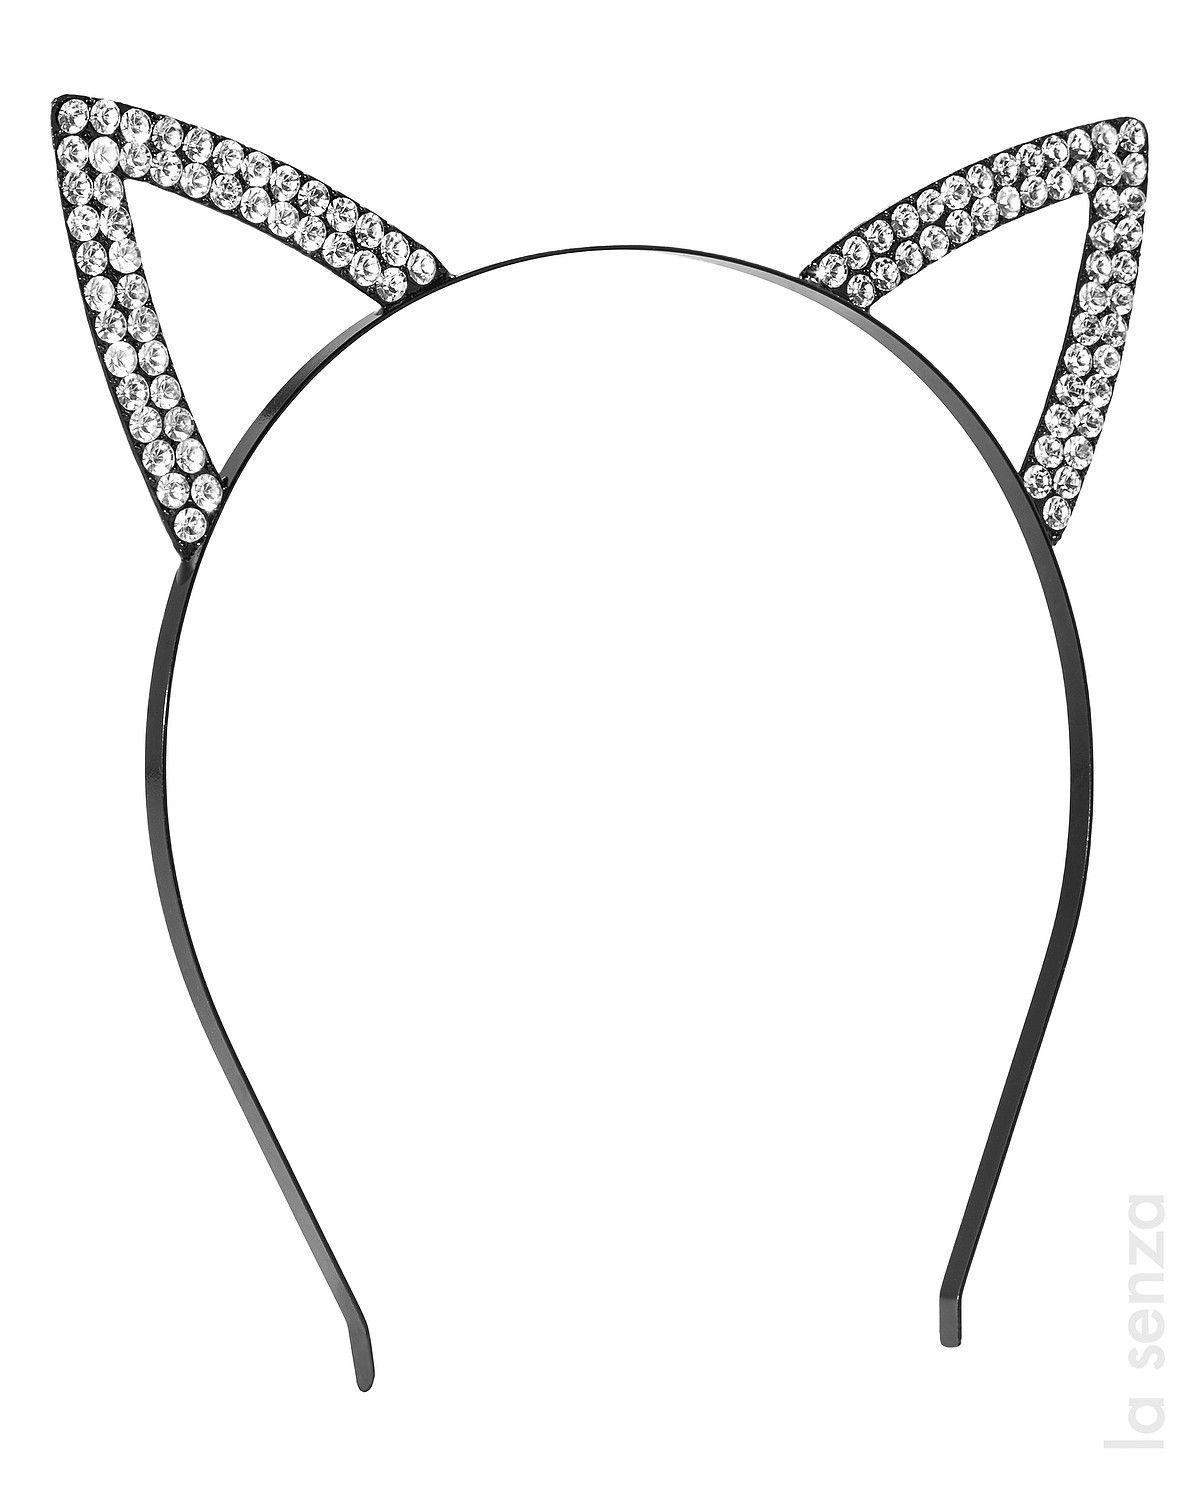 1200x1485 outfits cat ears headband, cat ears